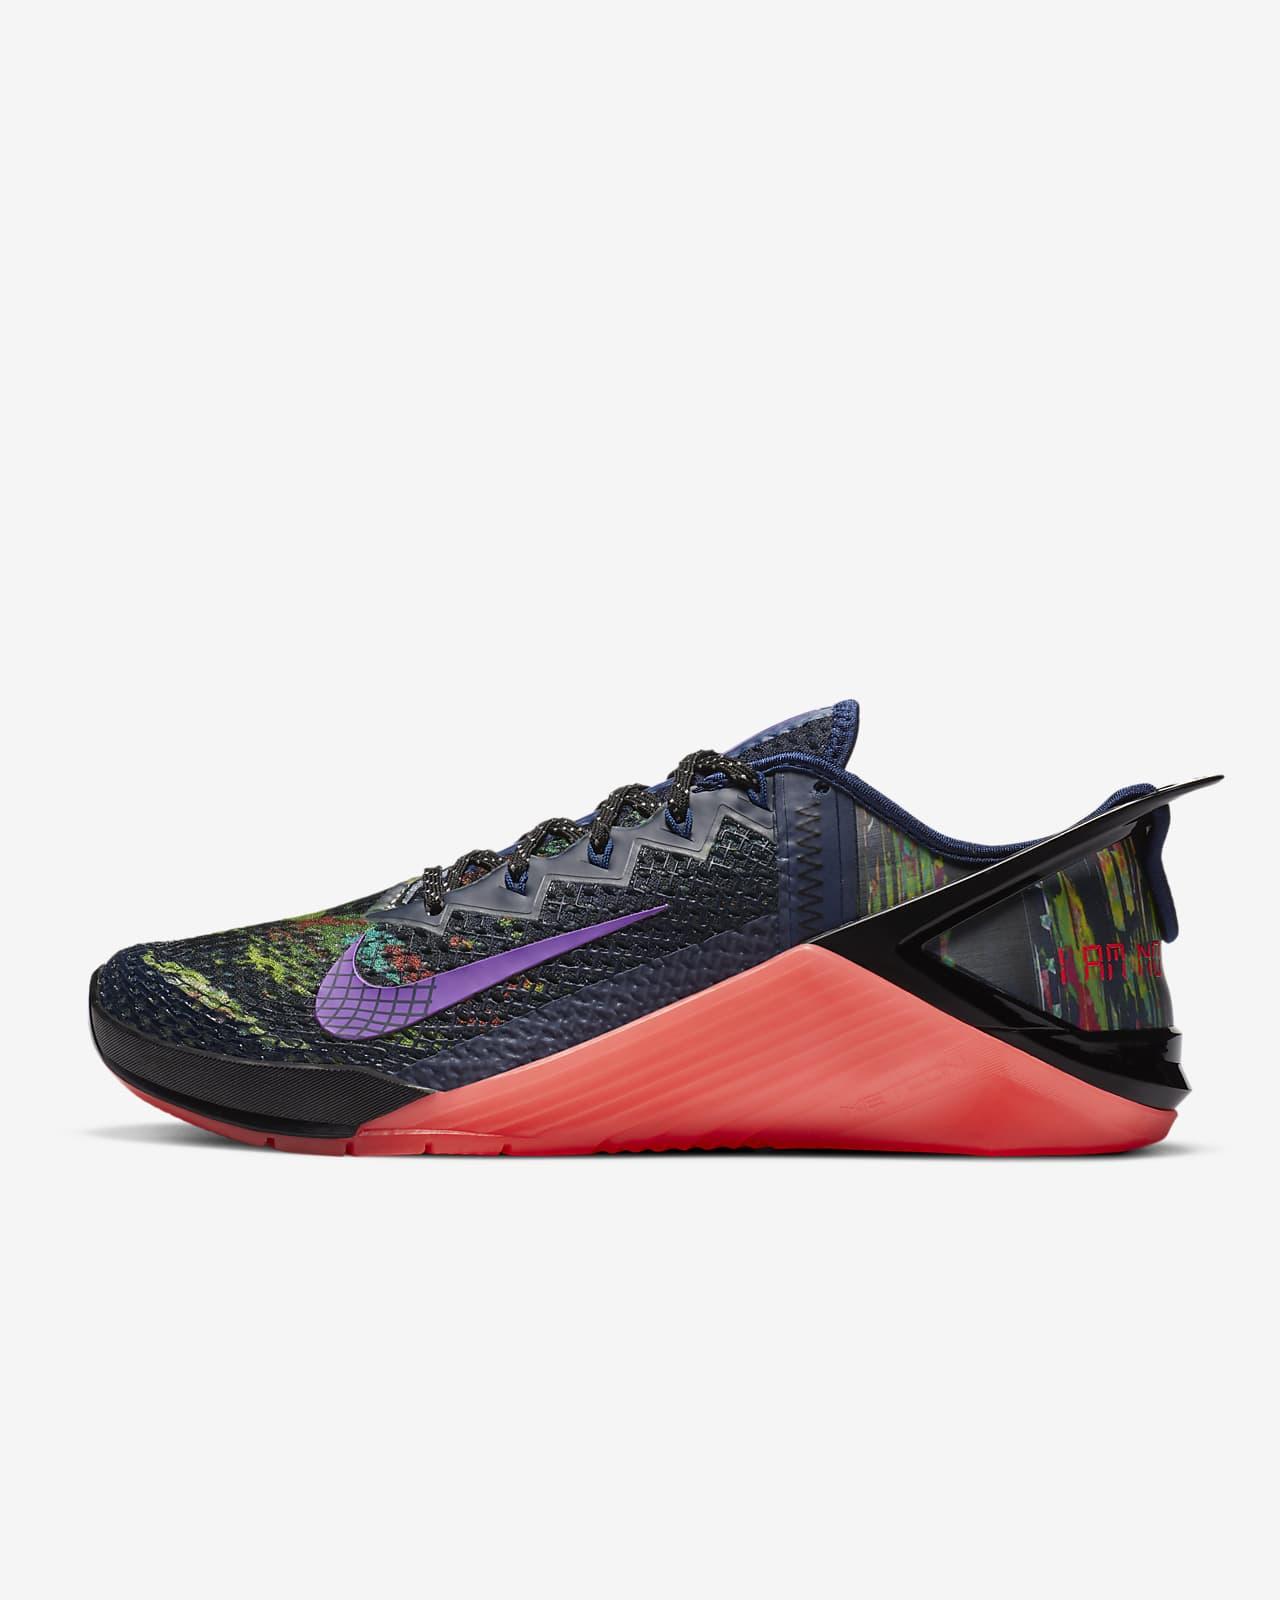 Chaussure de training Nike Metcon 6 FlyEase pour Femme